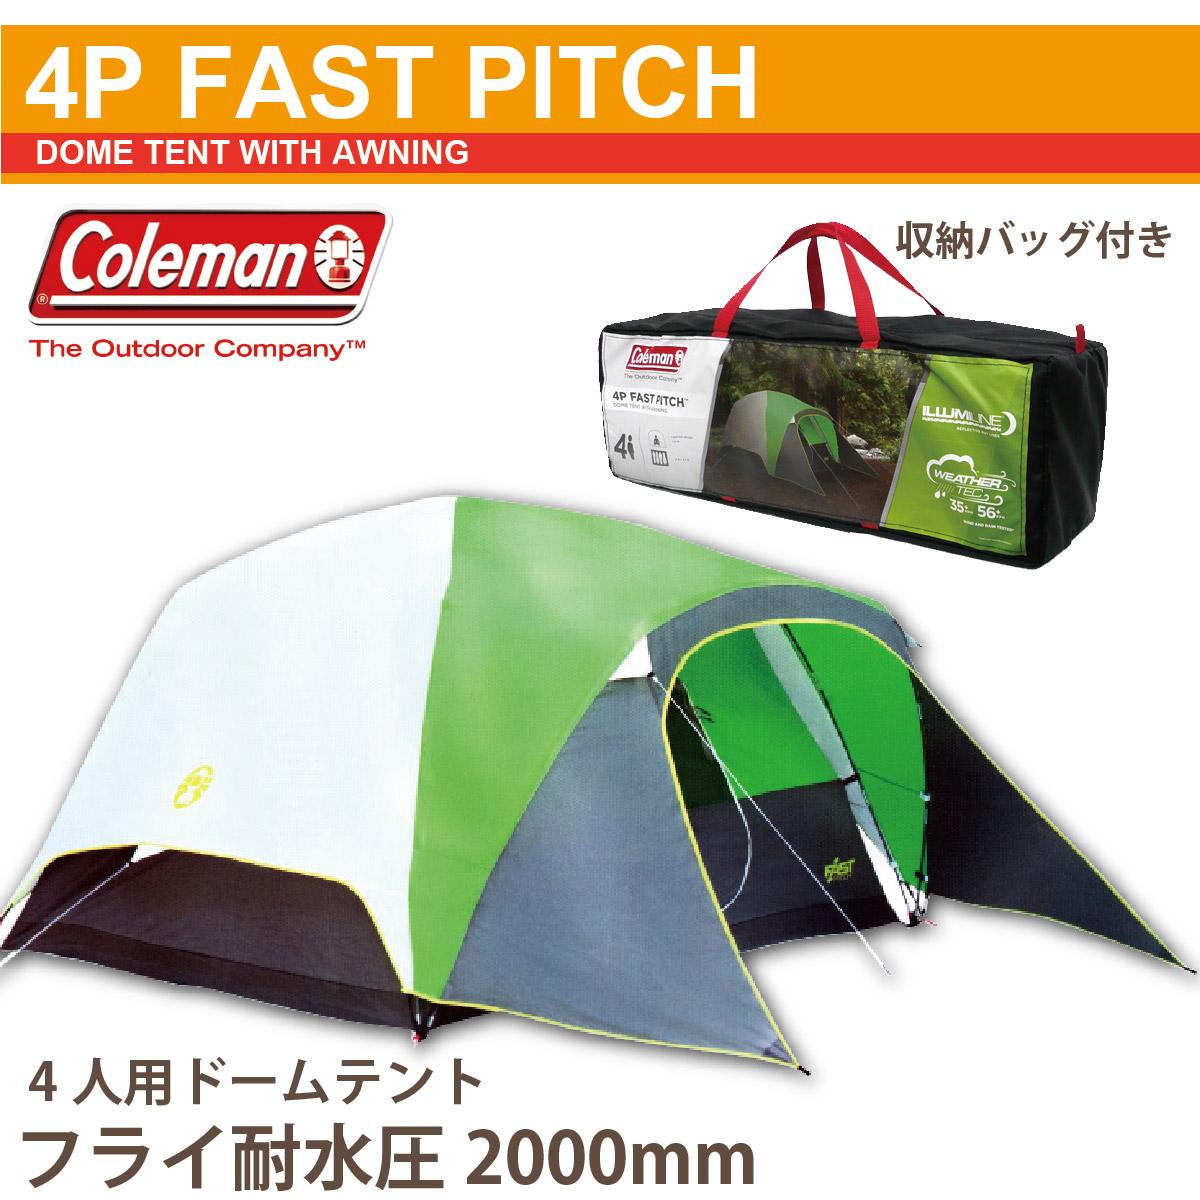 Product Information  sc 1 st  Rakuten & cherrybell_kitchen | Rakuten Global Market: Instant cabin camping ...